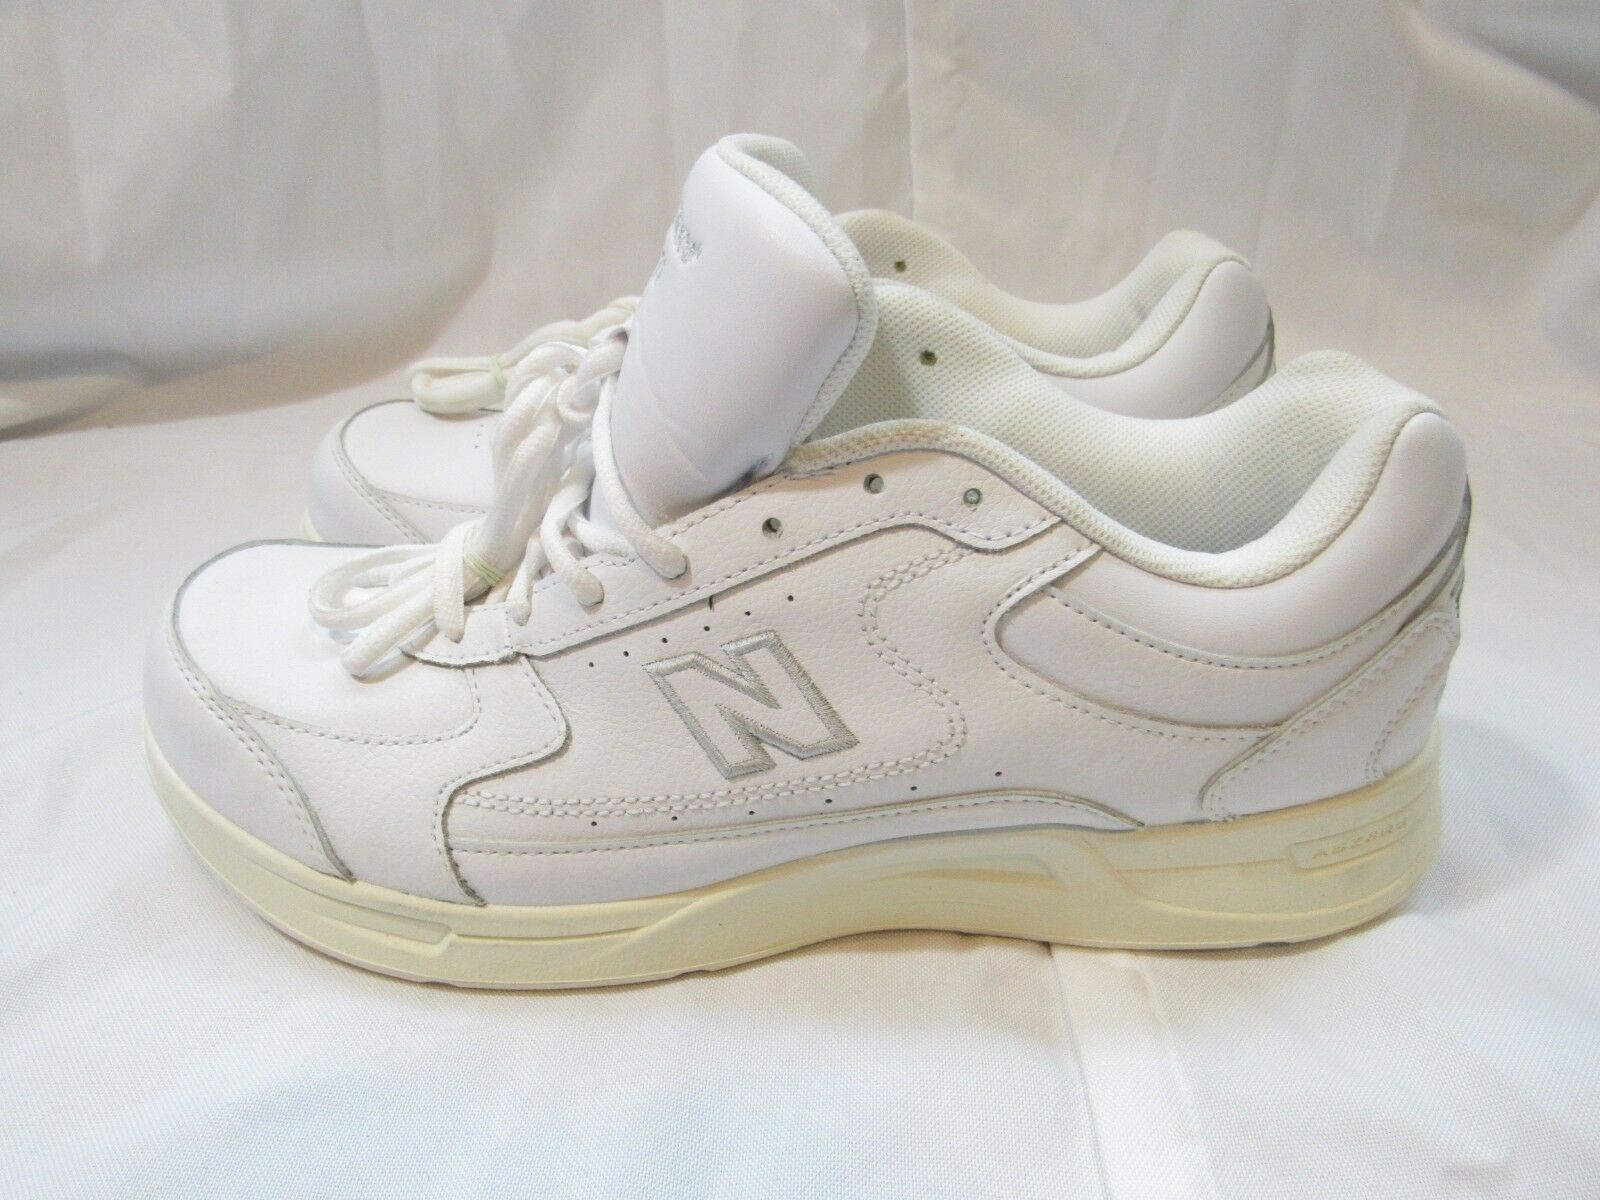 New Balance MW576WT Men's 10.5 D Walking shoes DSL-2 White New